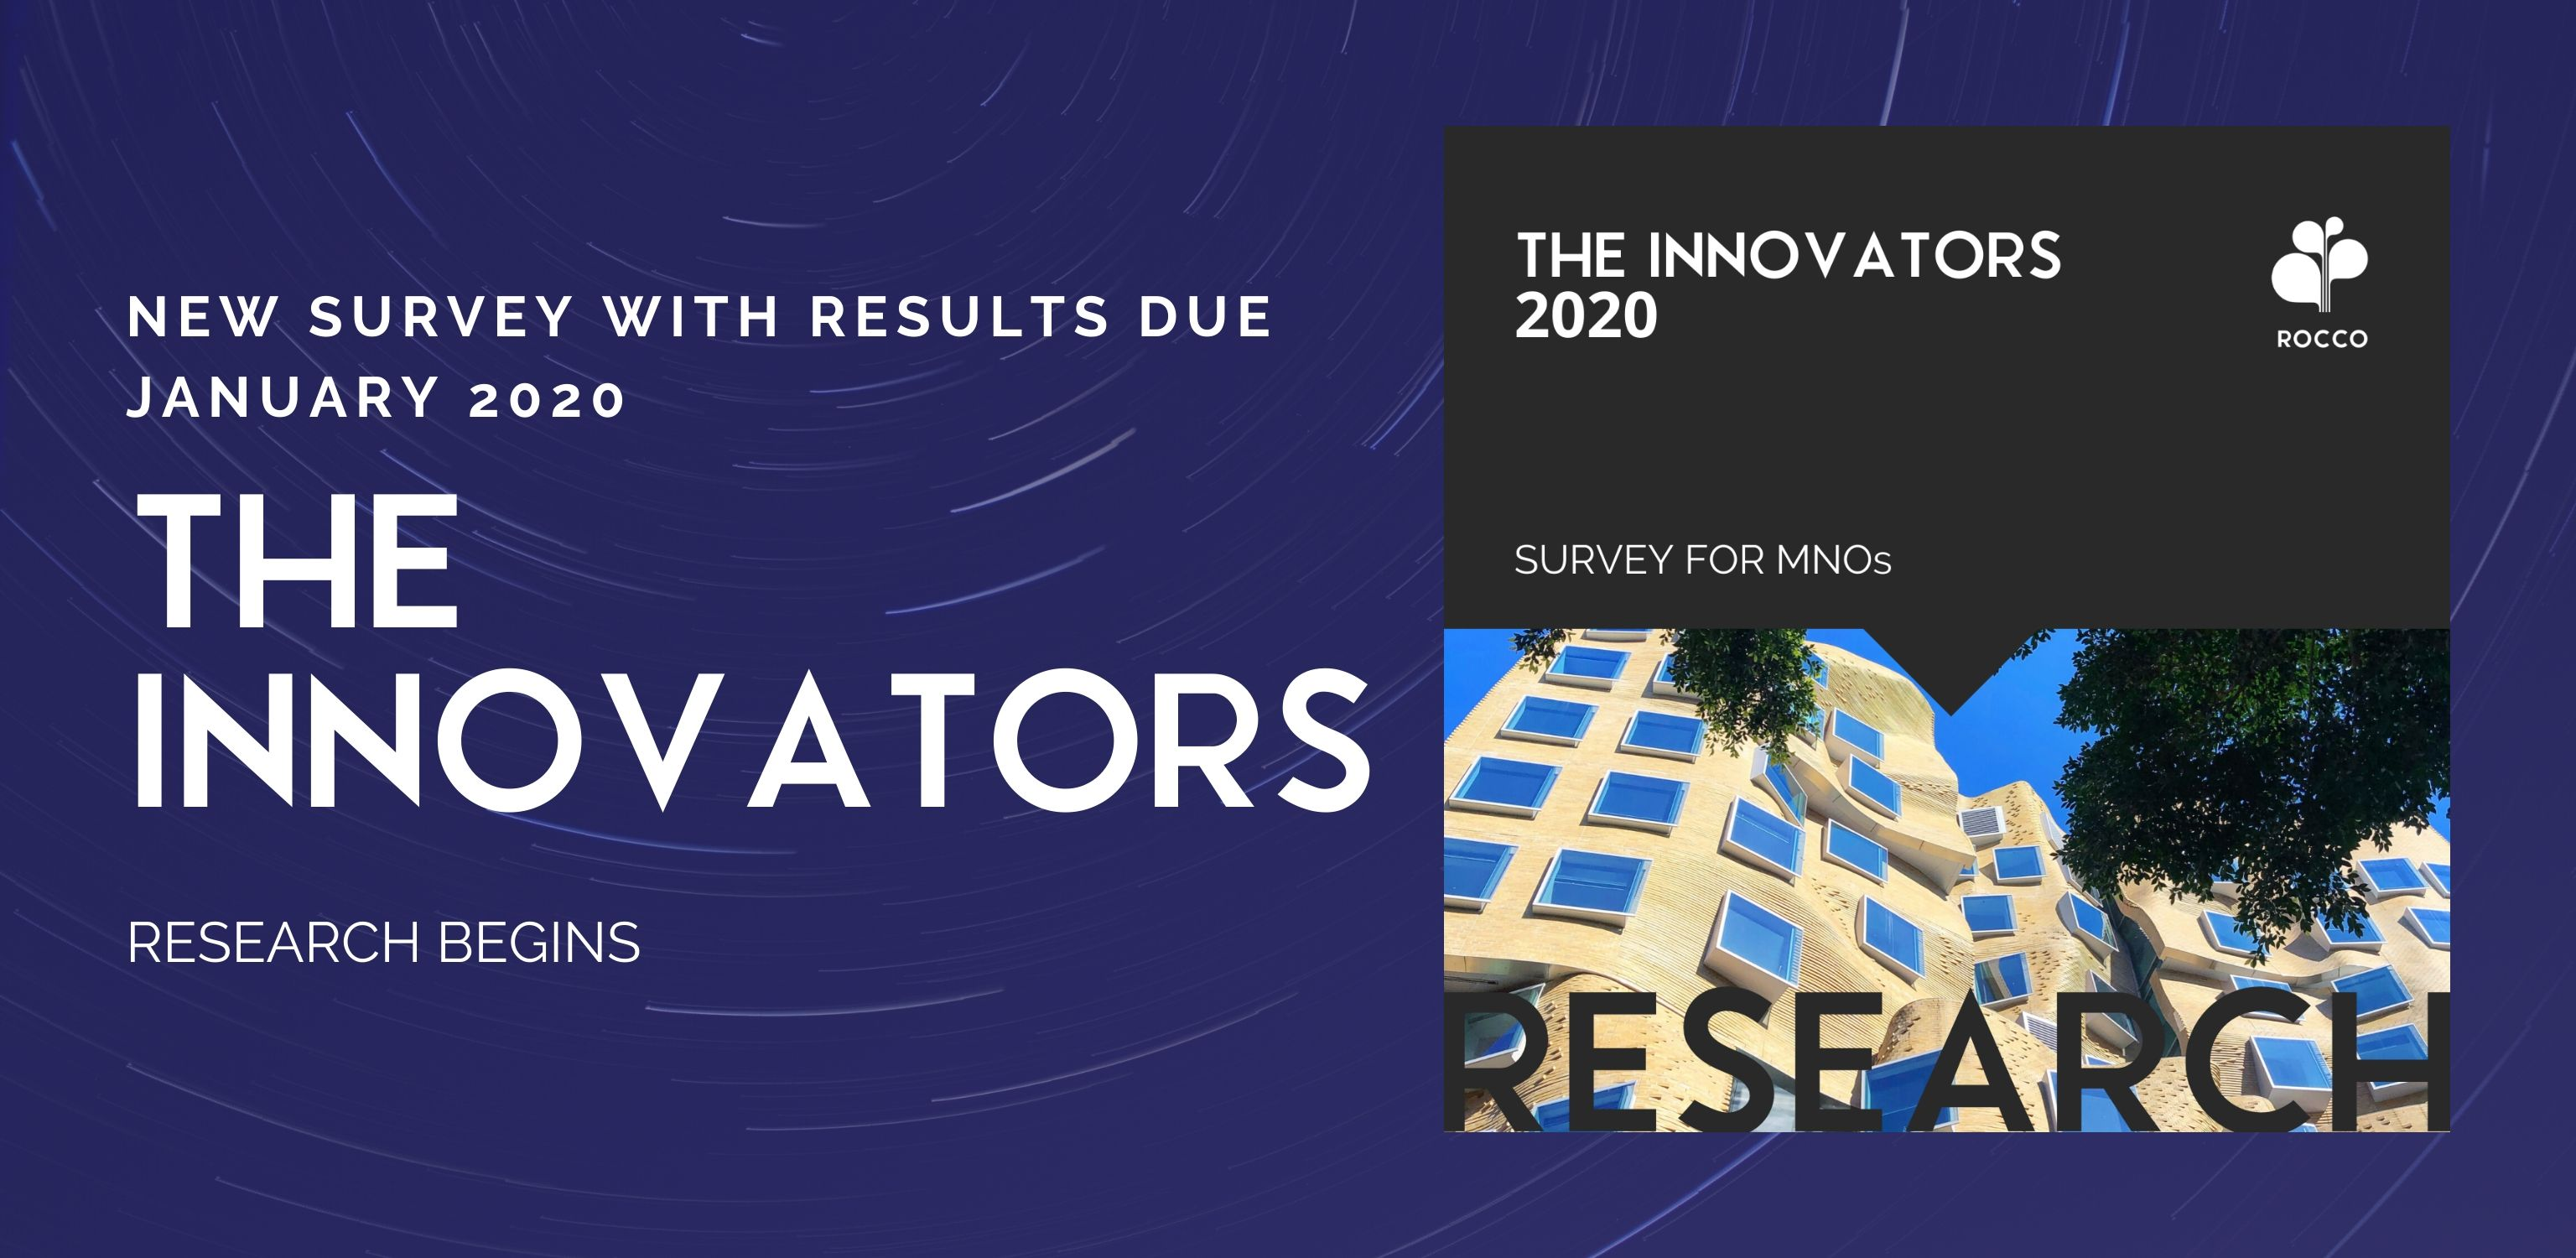 The INNOVATORS 2020